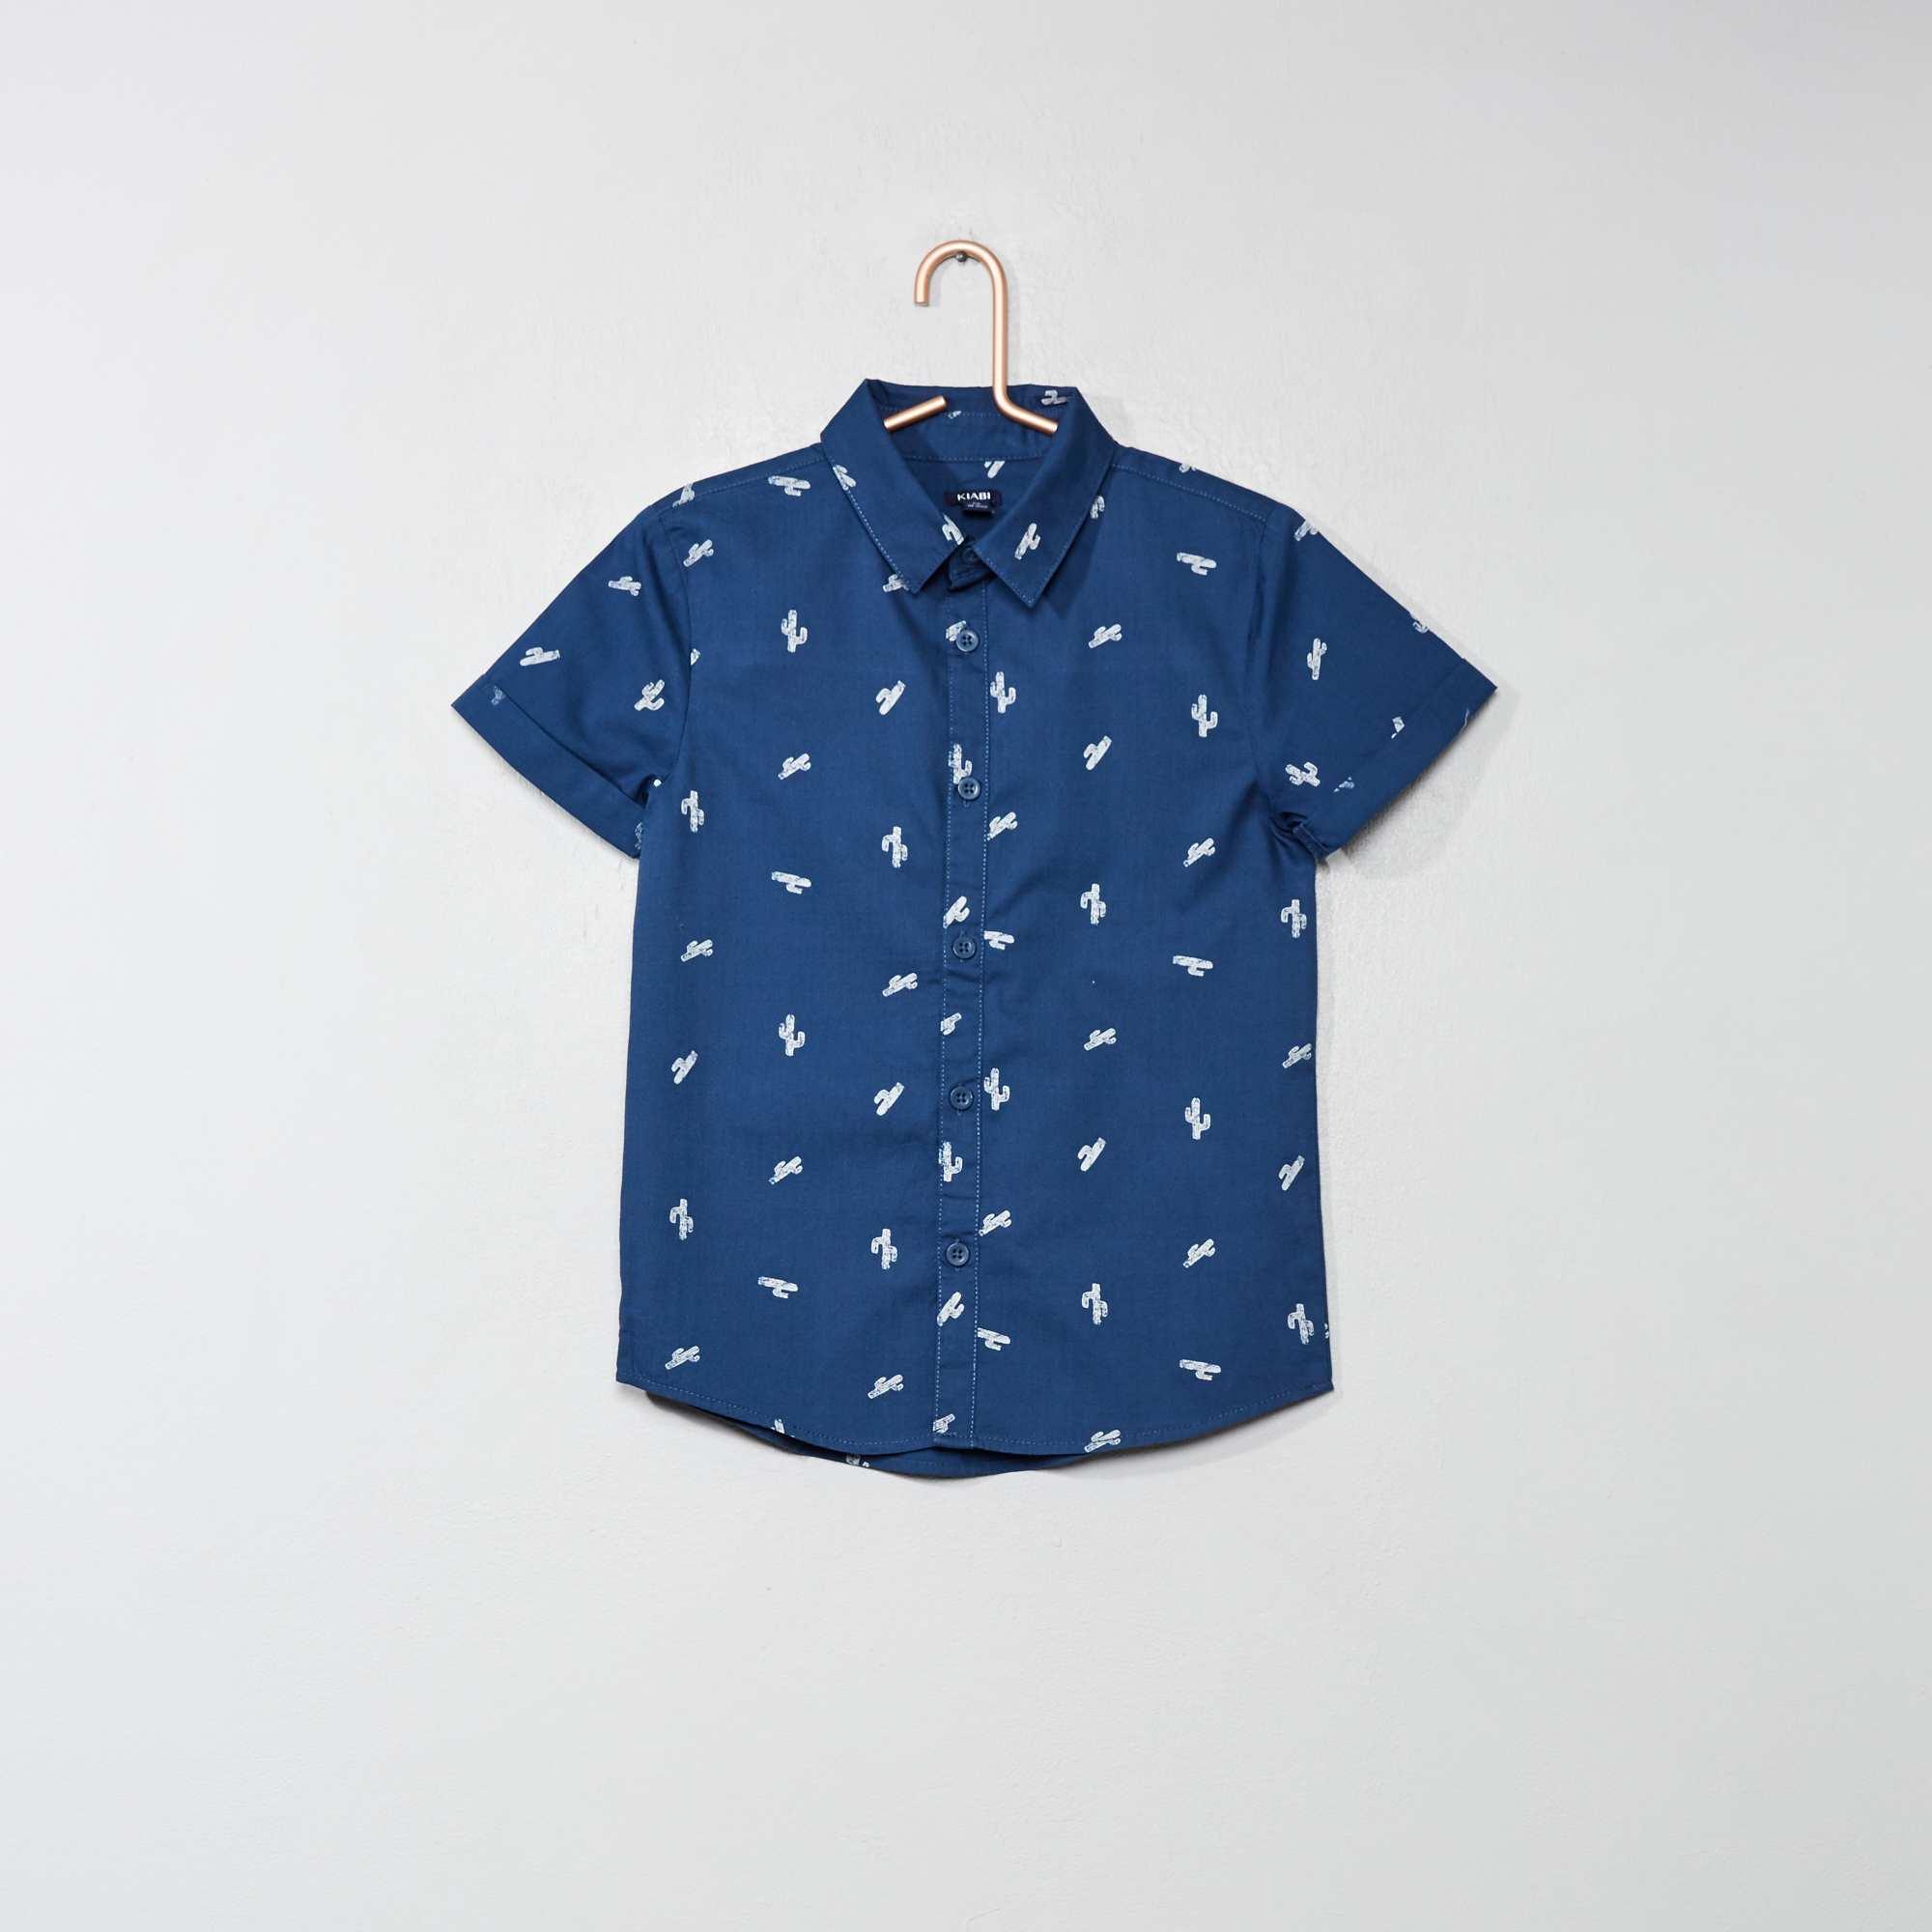 c38cdd9b5 Camisa estampada de popelina Chico - AZUL - Kiabi - 7